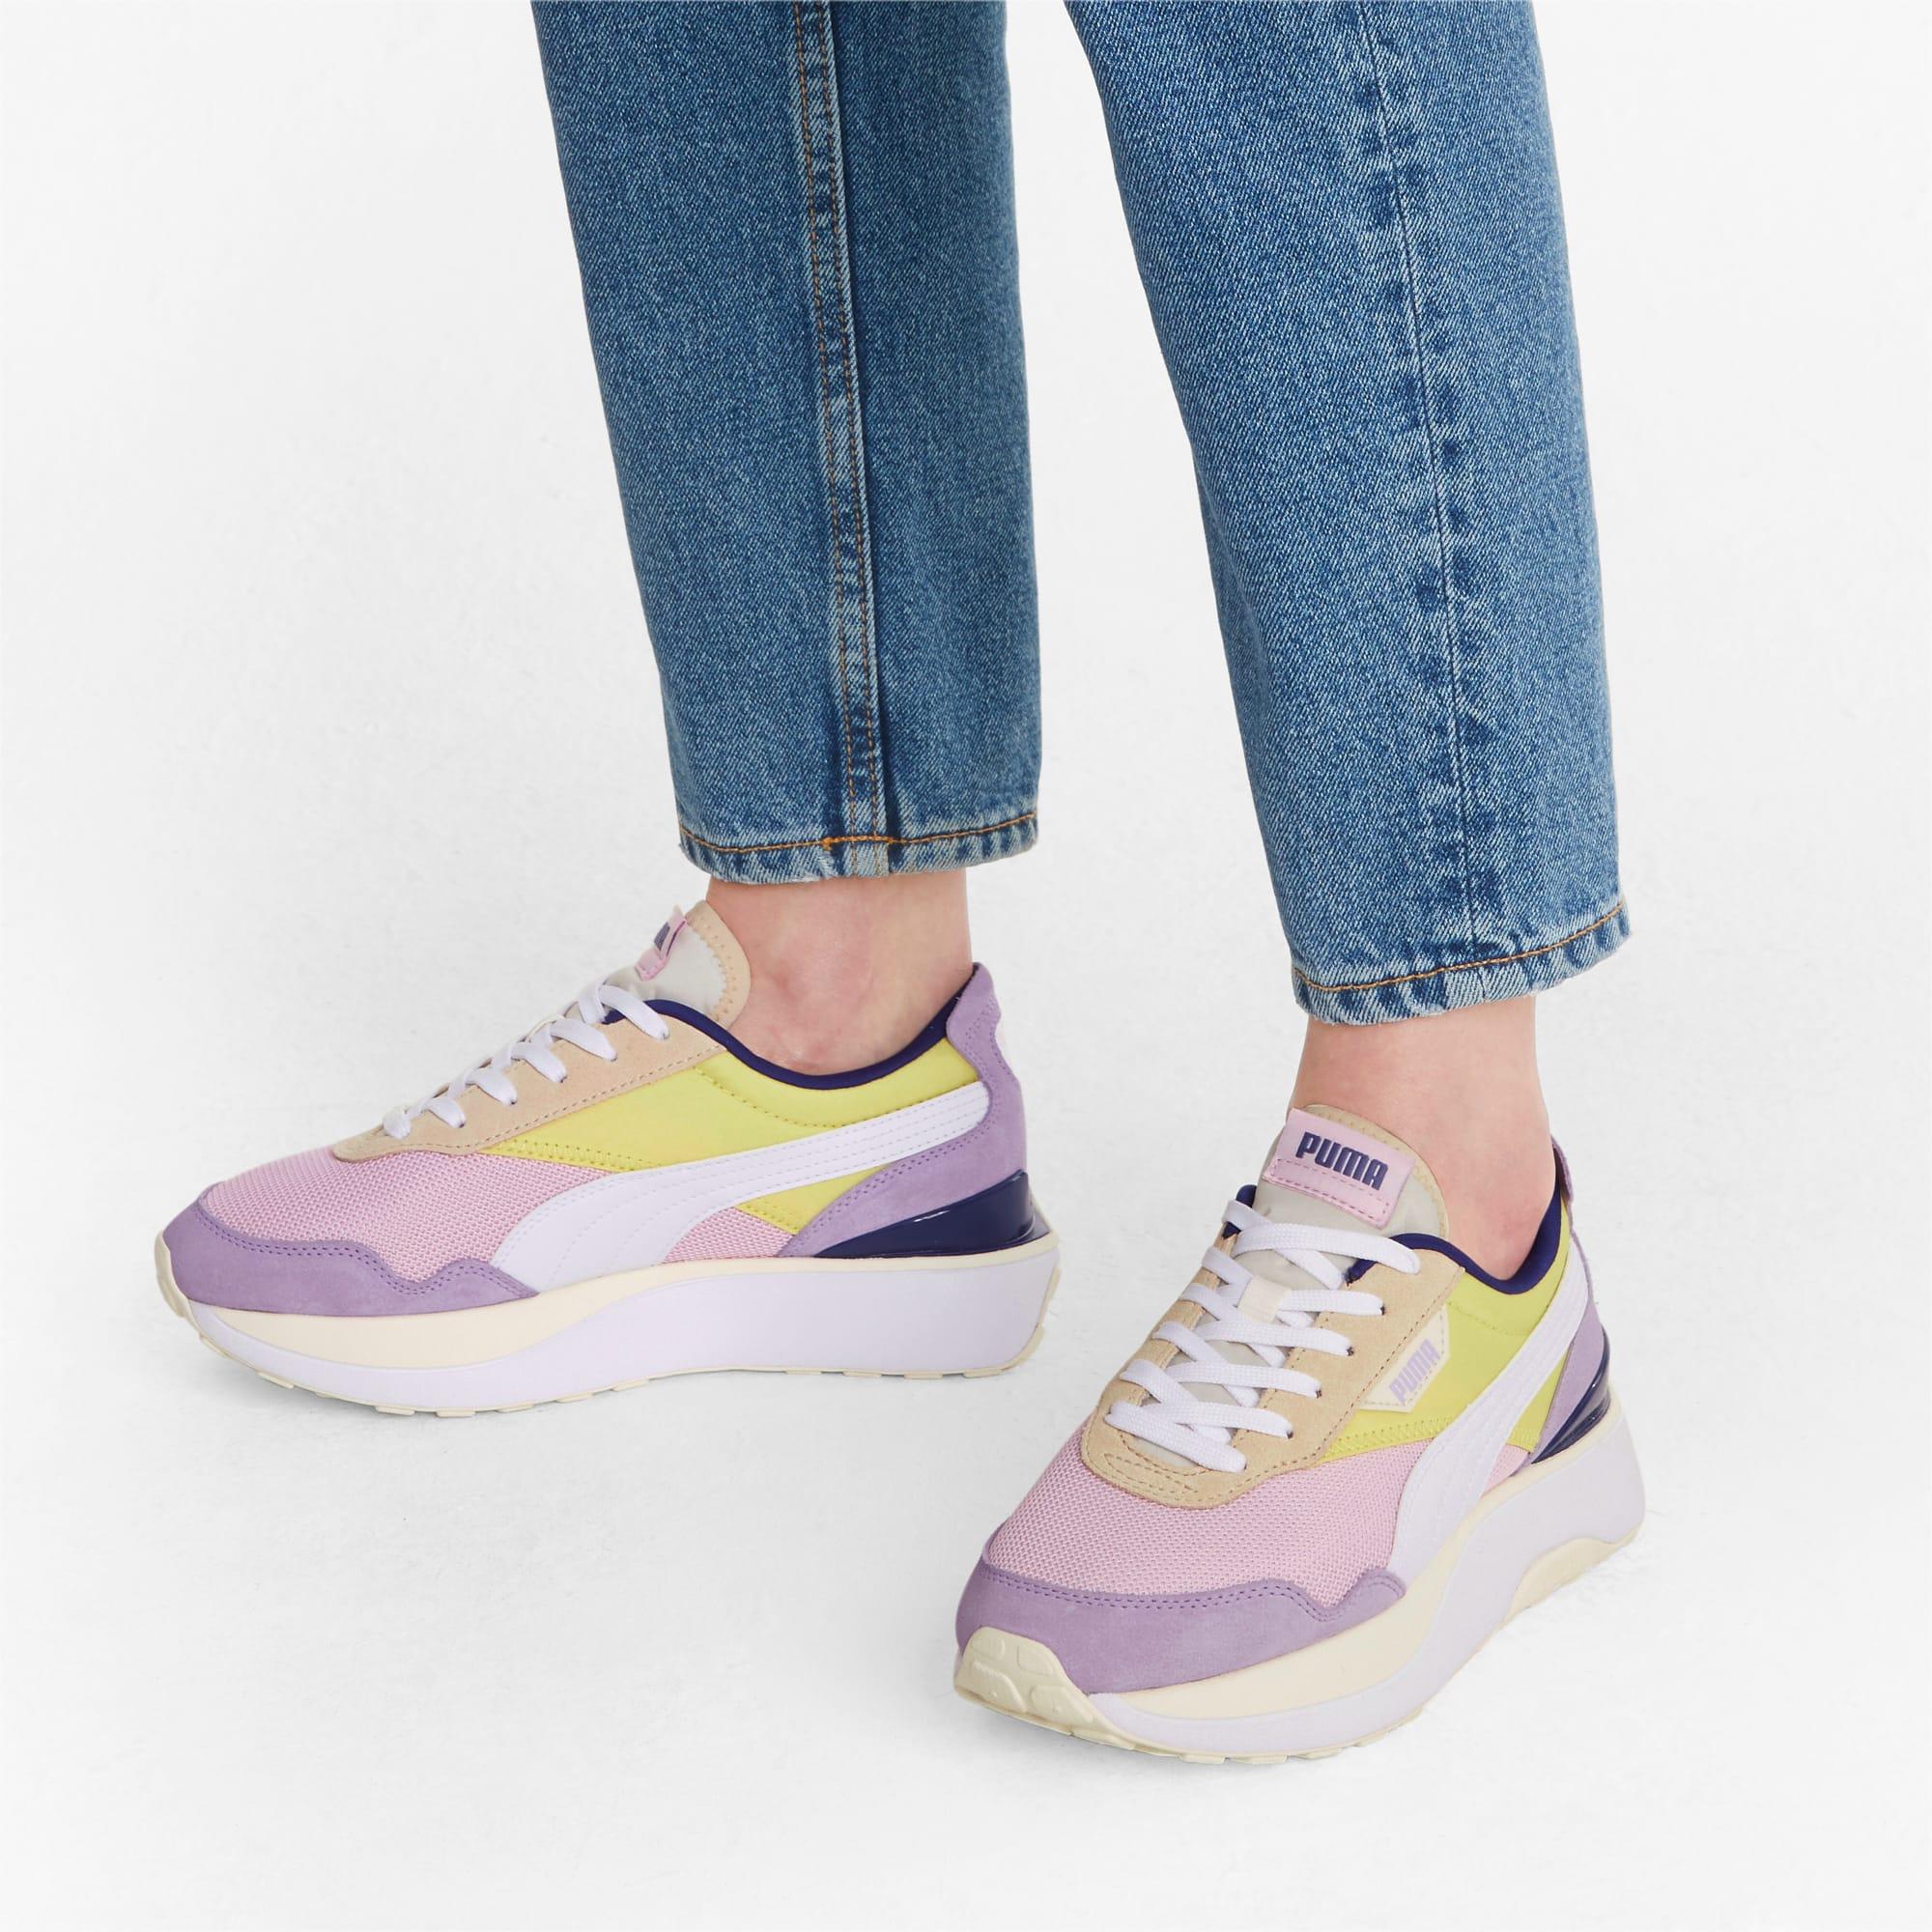 Cruise Rider Women's Sneakers